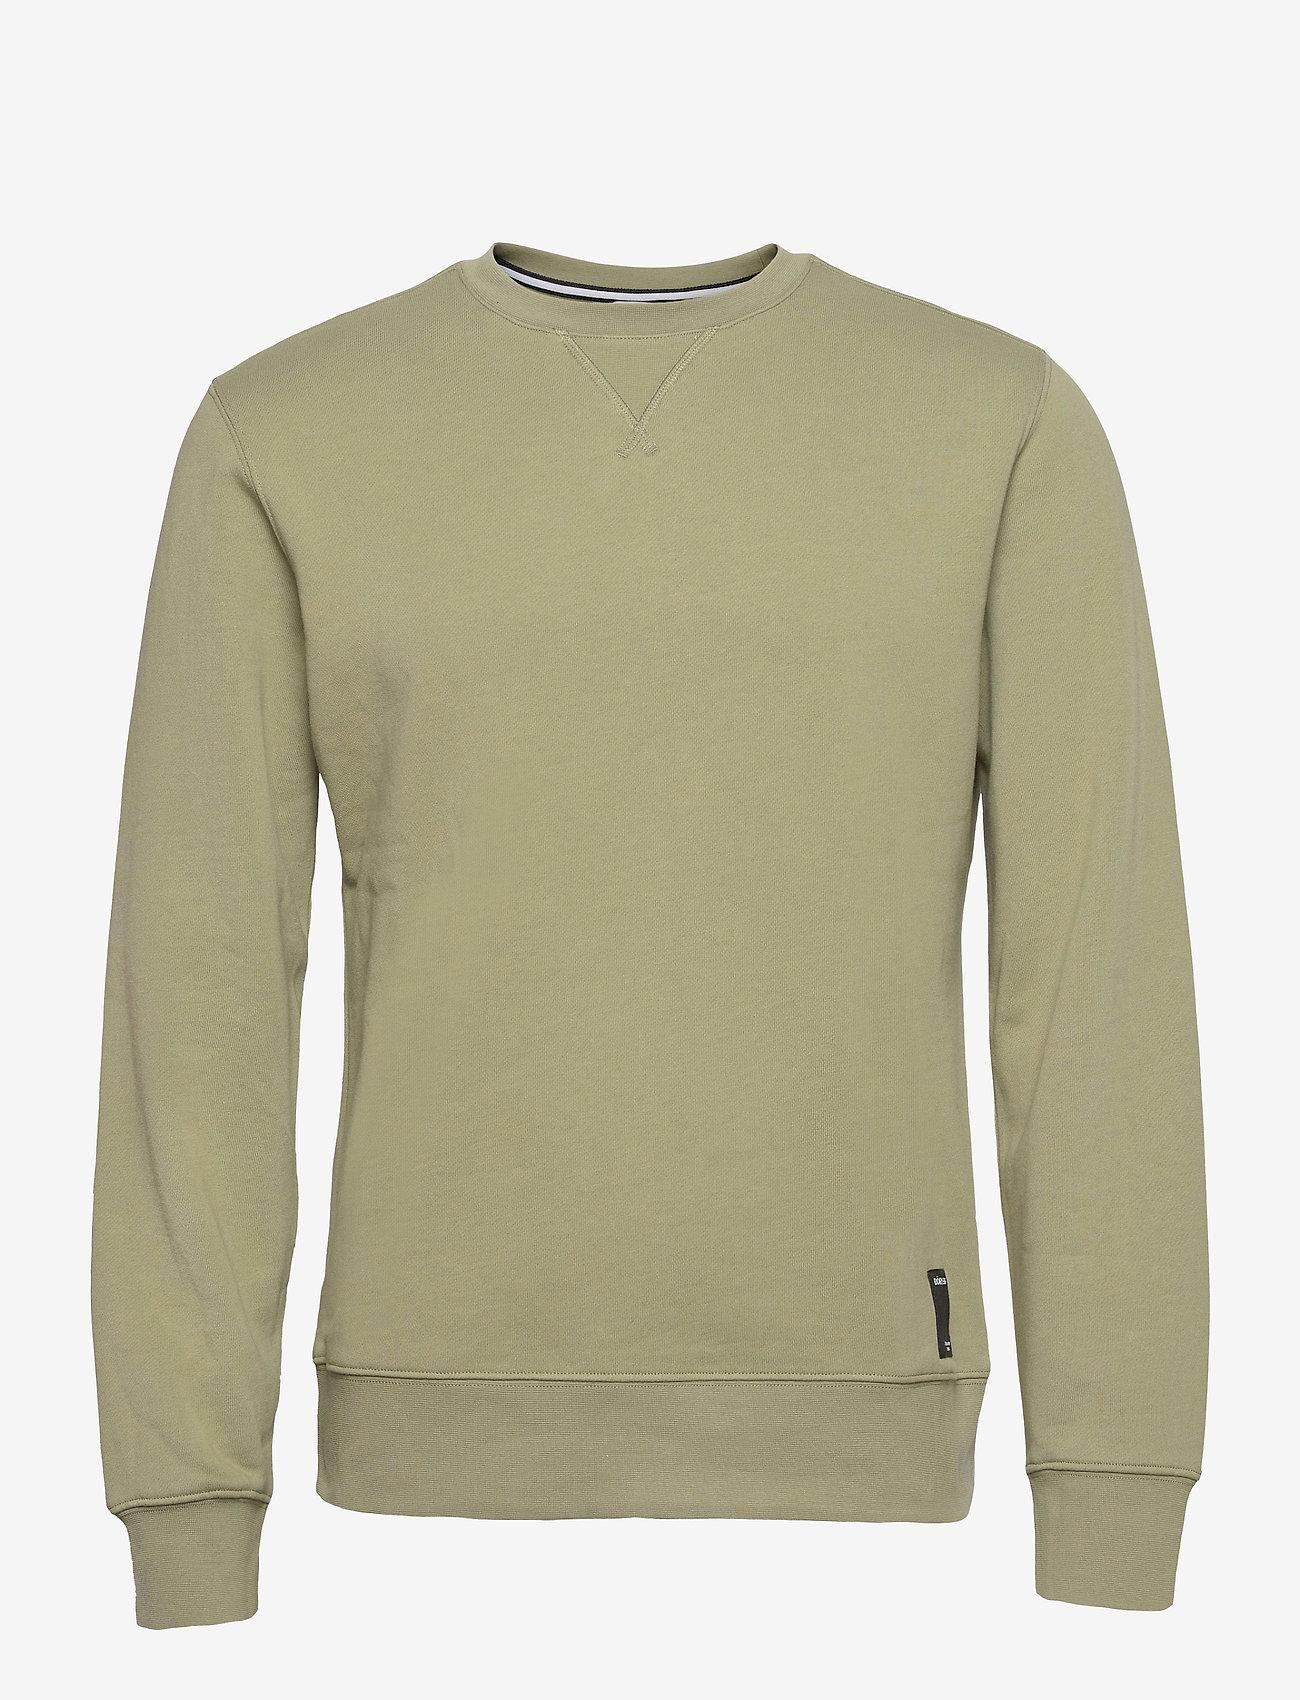 Björn Borg - CREW CENTRE CENTRE - basic sweatshirts - oil green - 0